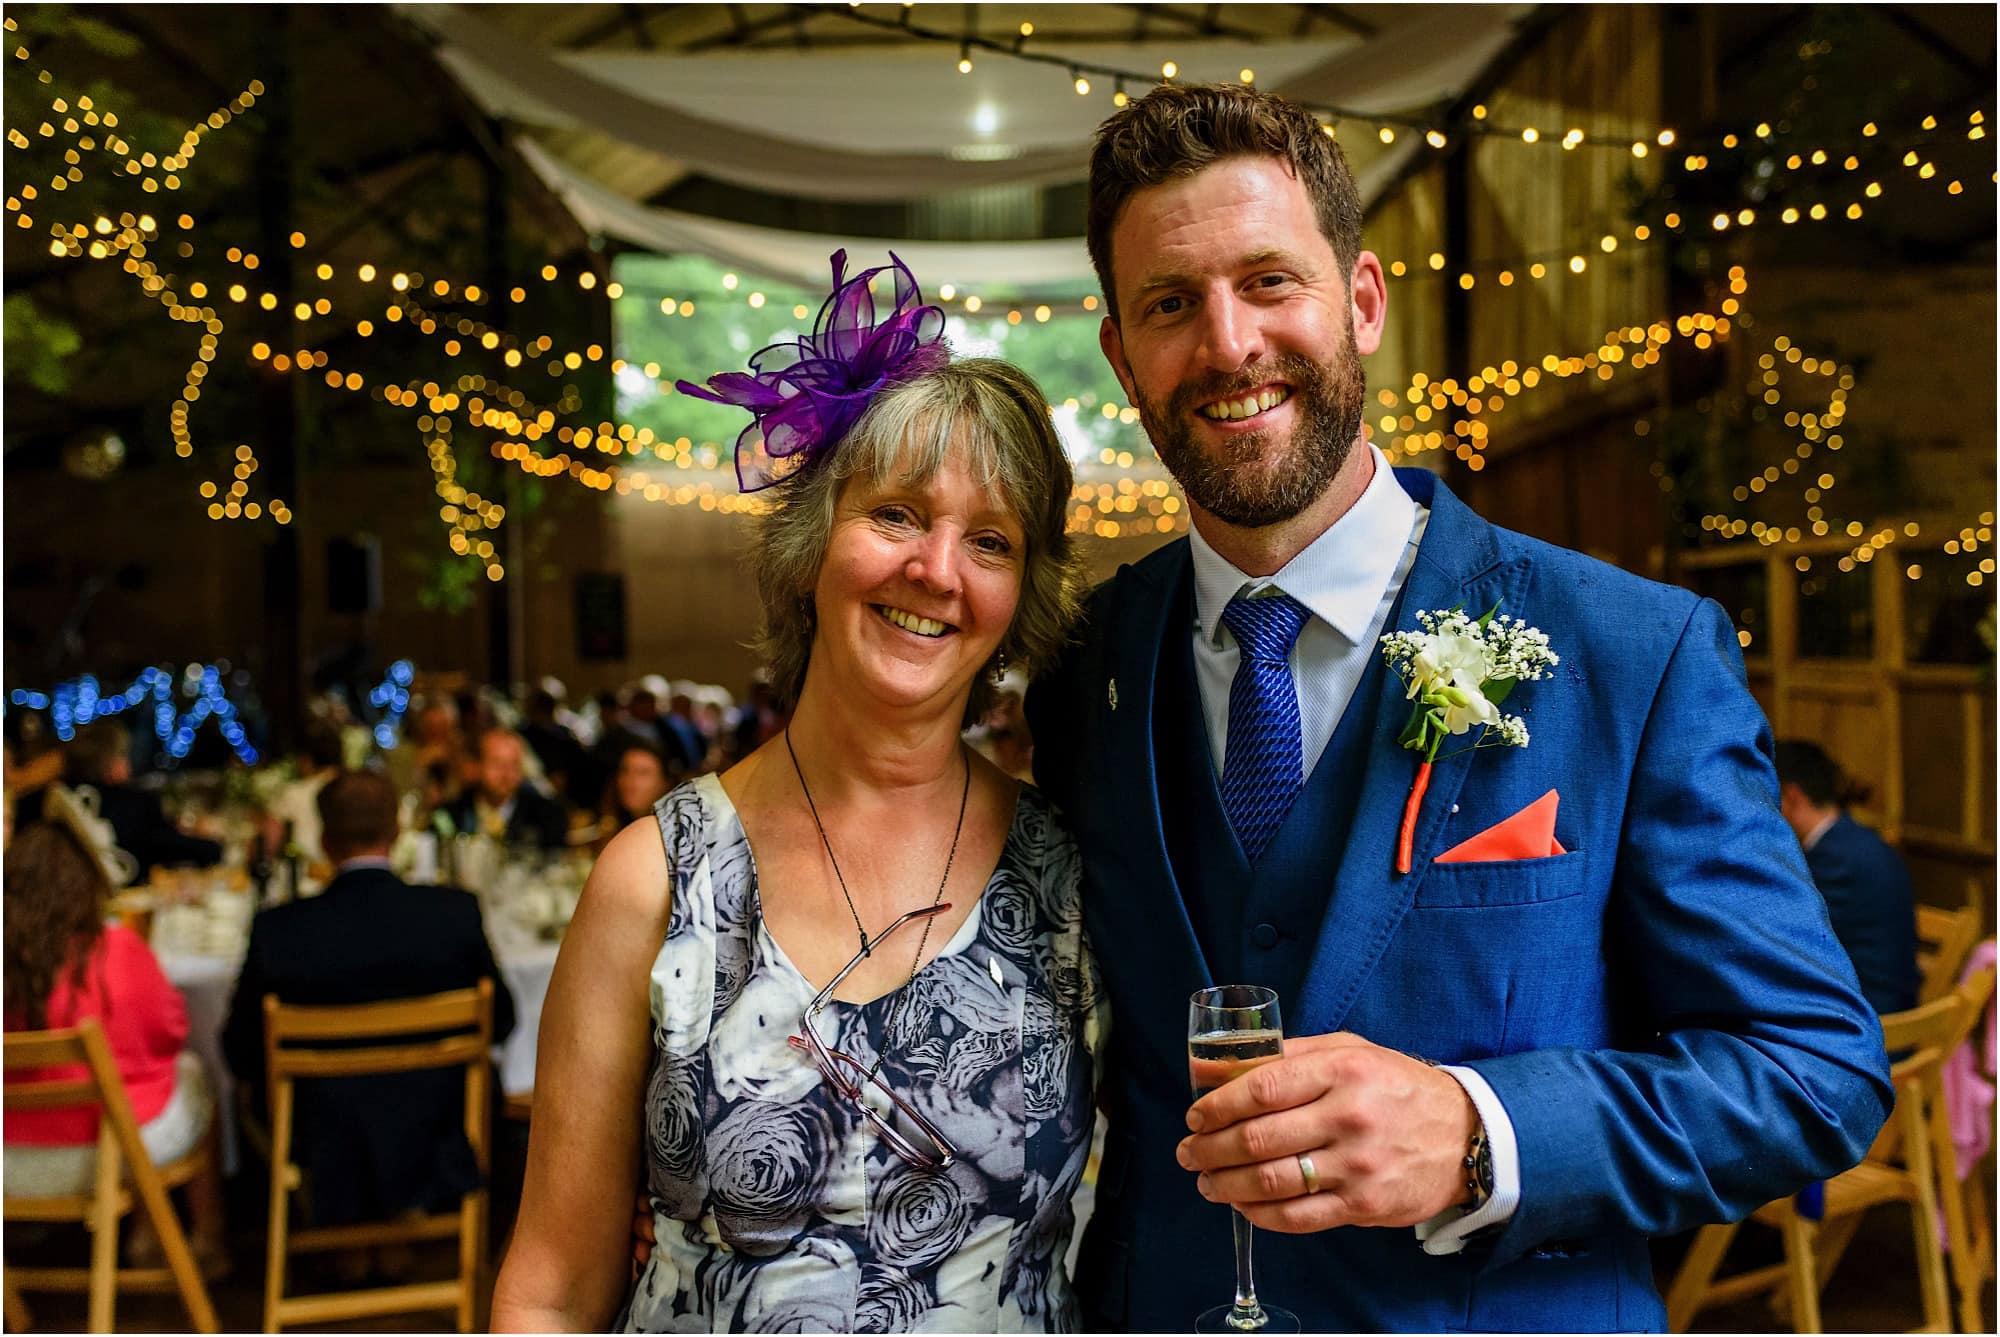 mum and groom